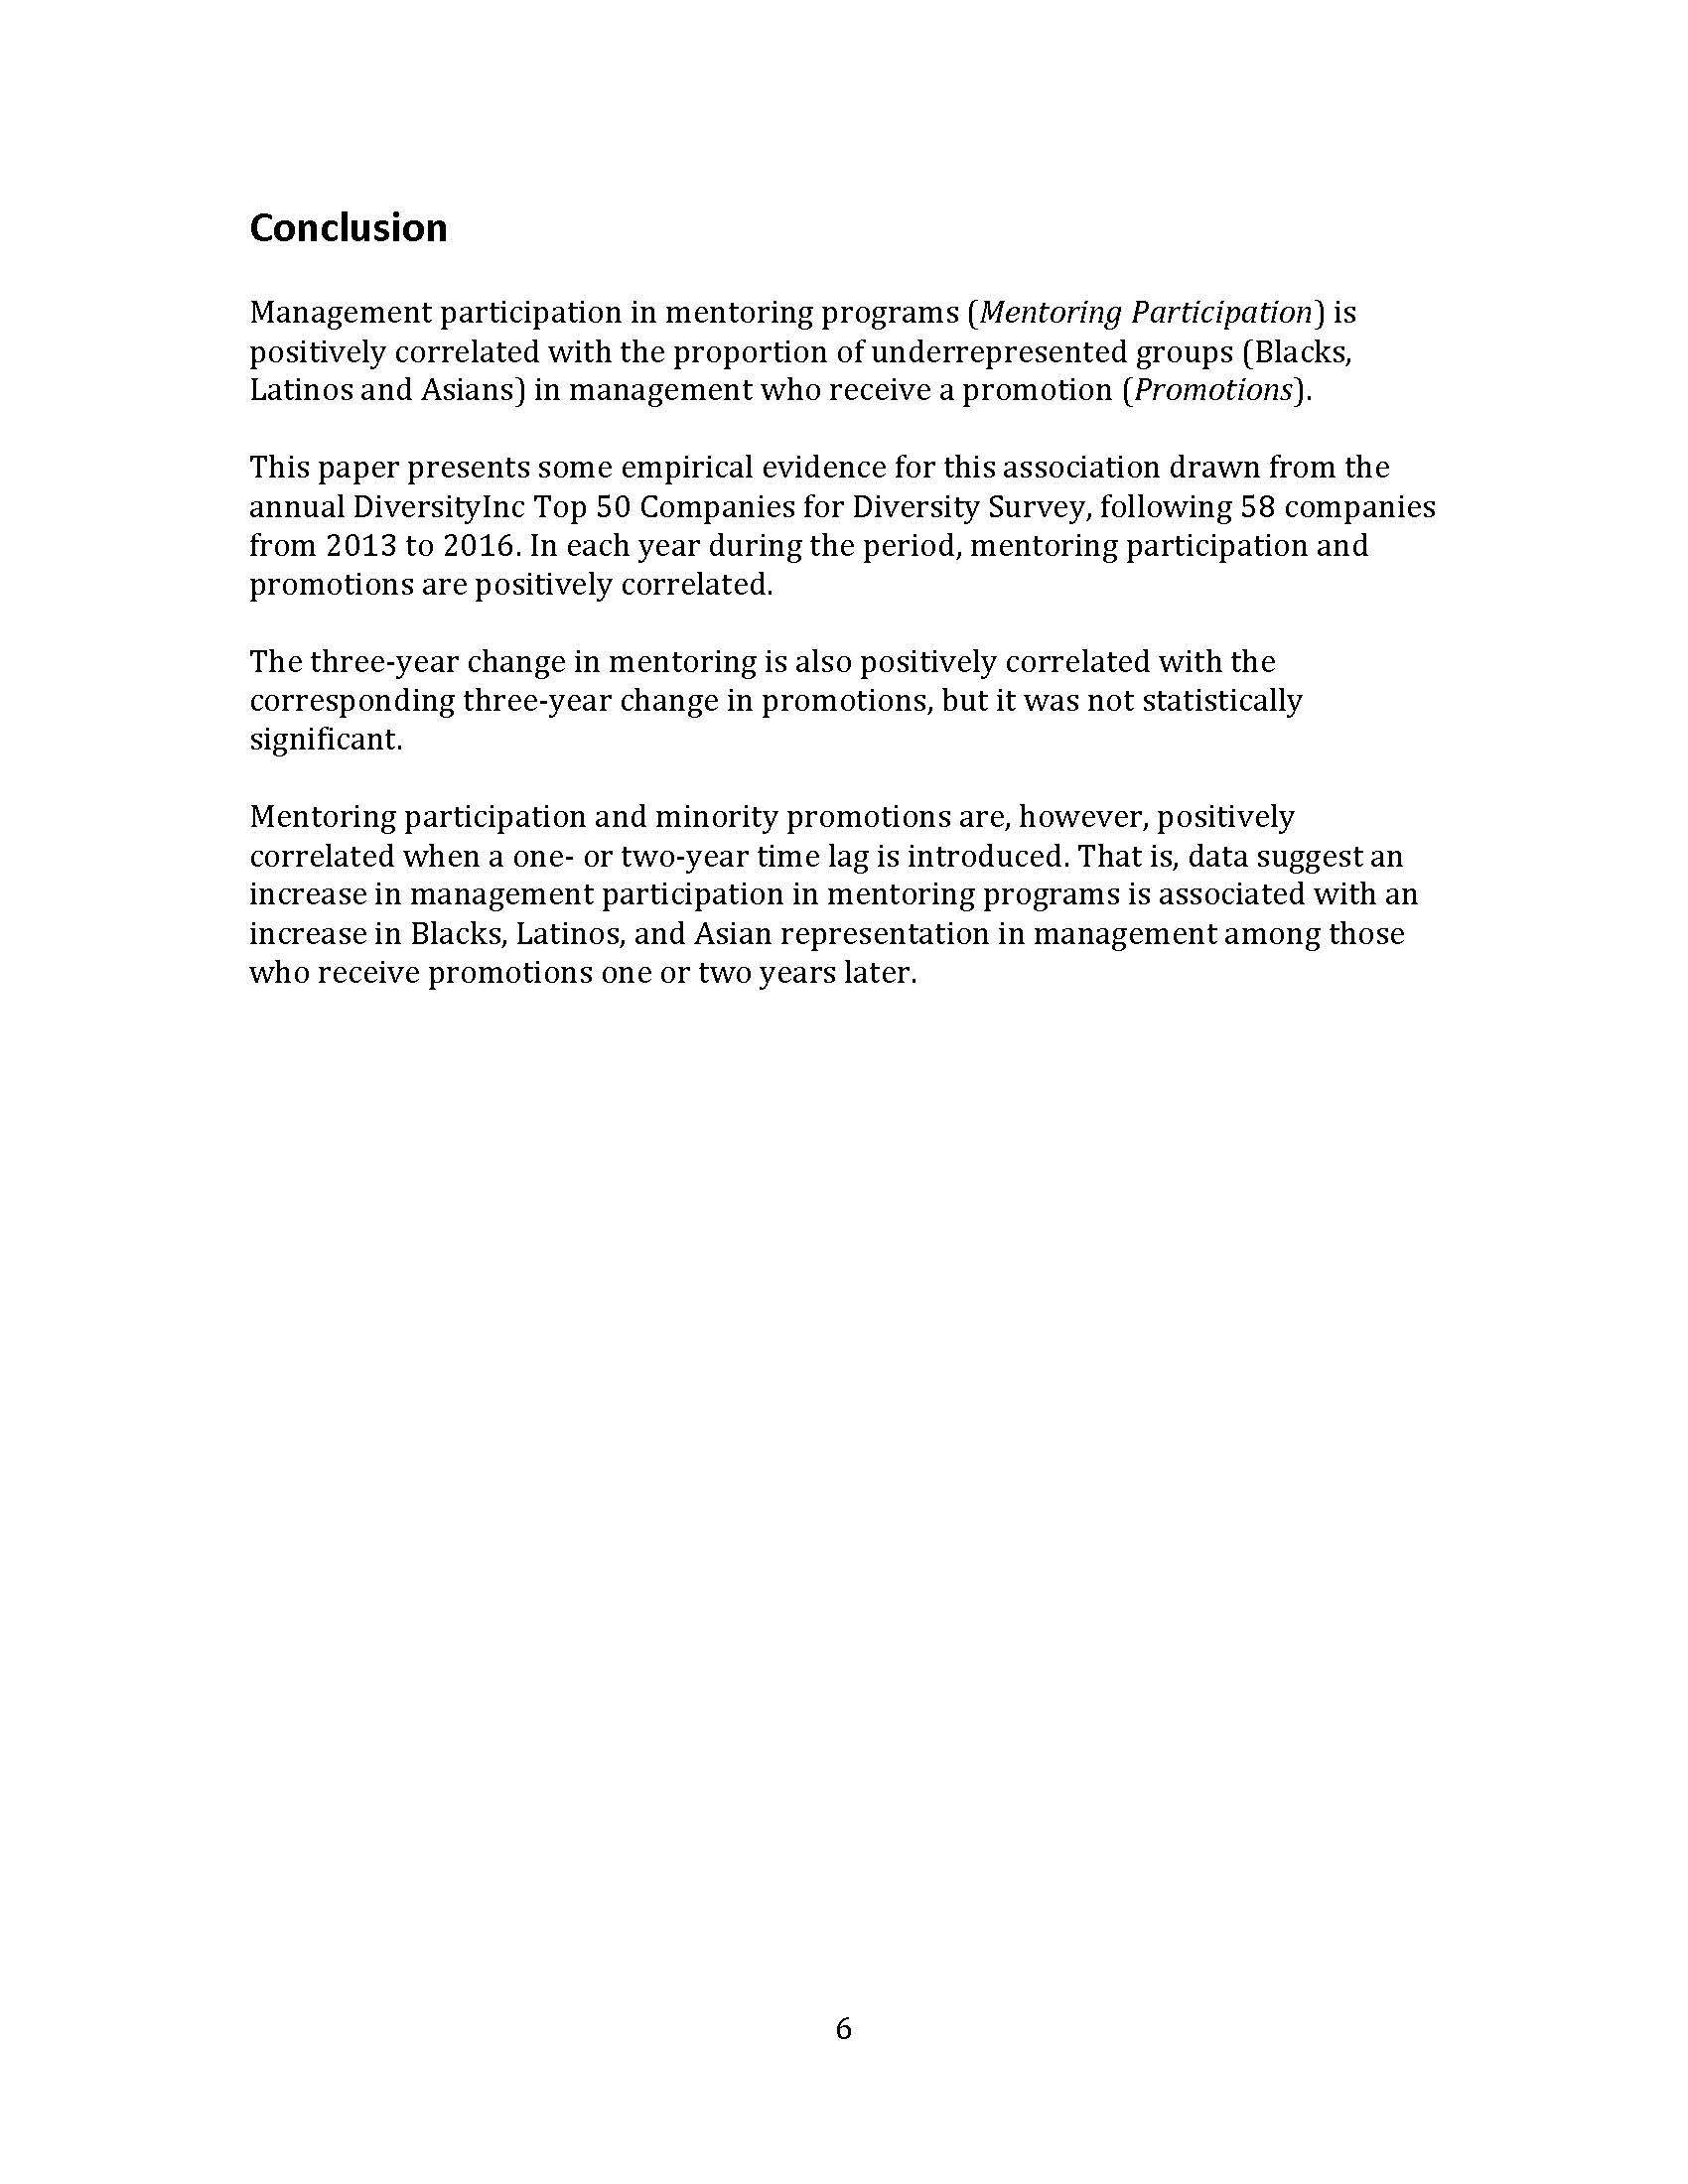 whitepapermentoringandpromotions20161220jpeg_page_6